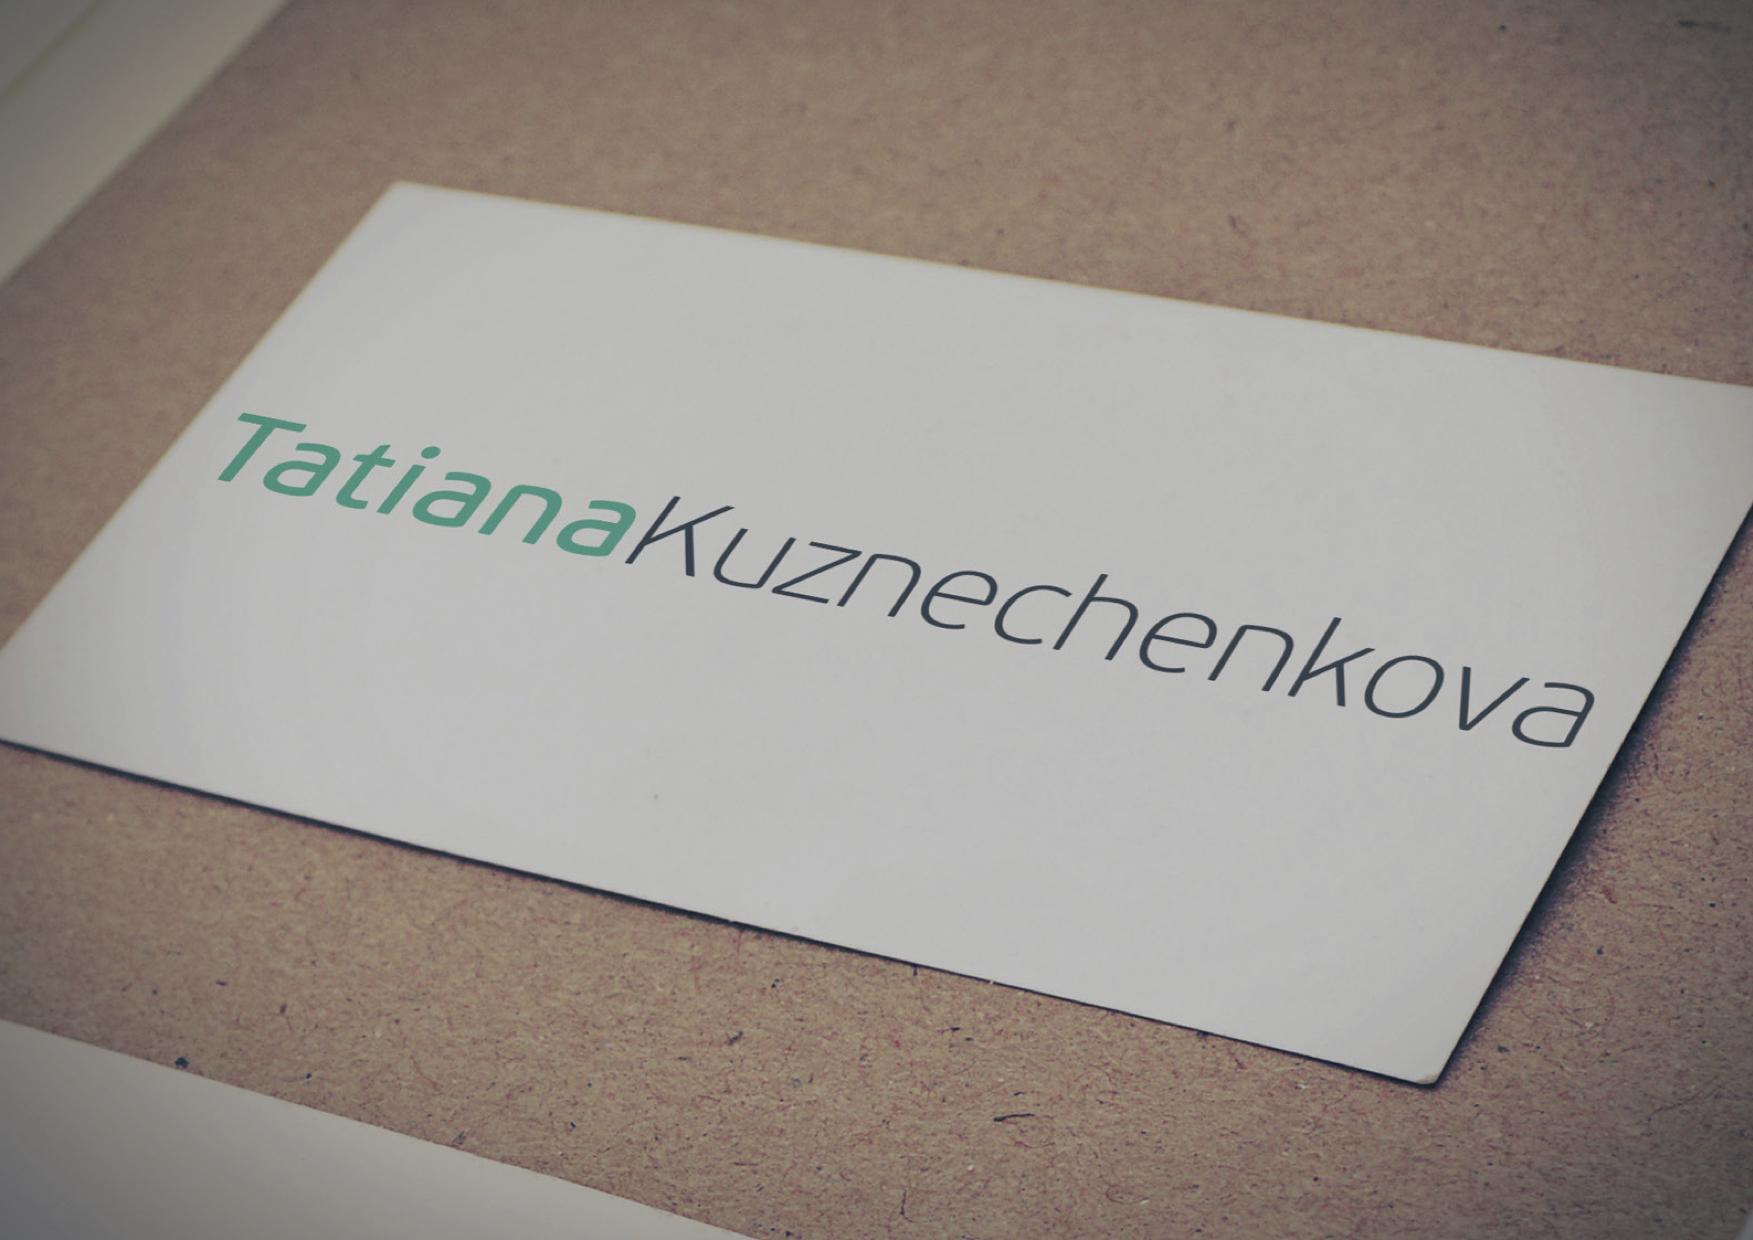 Tatiana-Kuznechenkova-Logo-00-Final